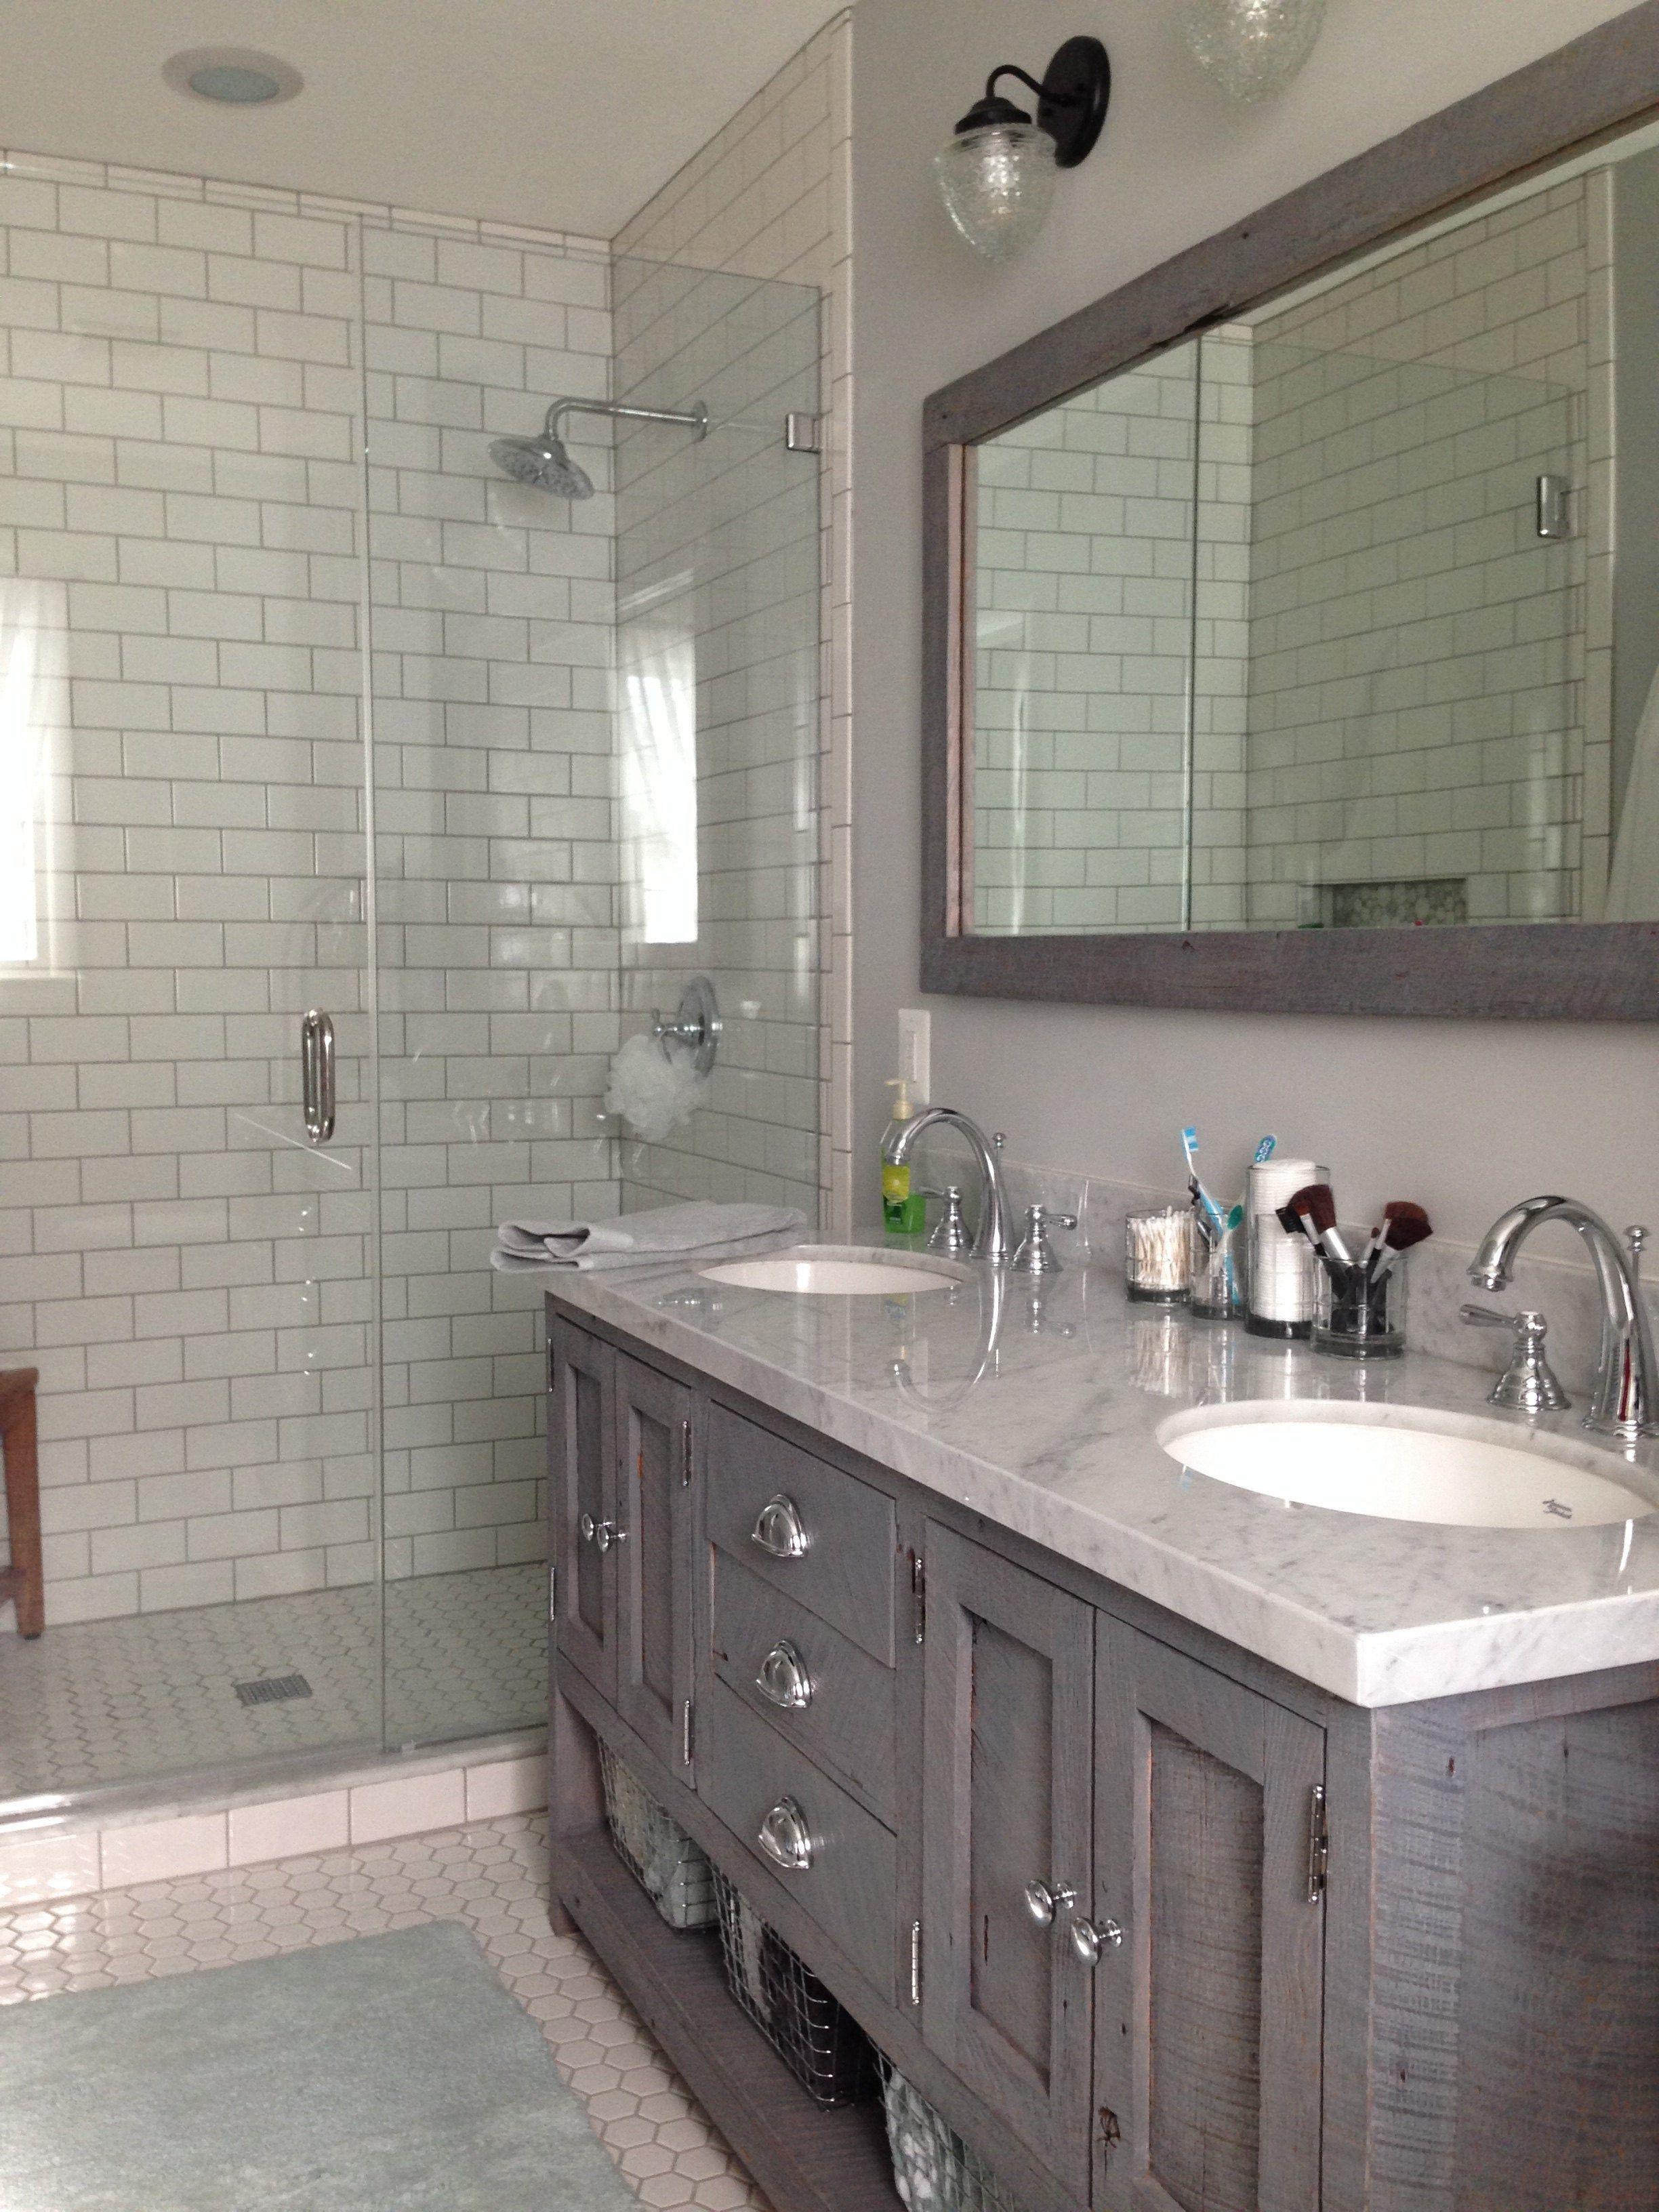 Island Falls Glass Wall Sconce Fixture Small Bathroom Makeover Bathroom Remodel Shower Bathroom Interior Design